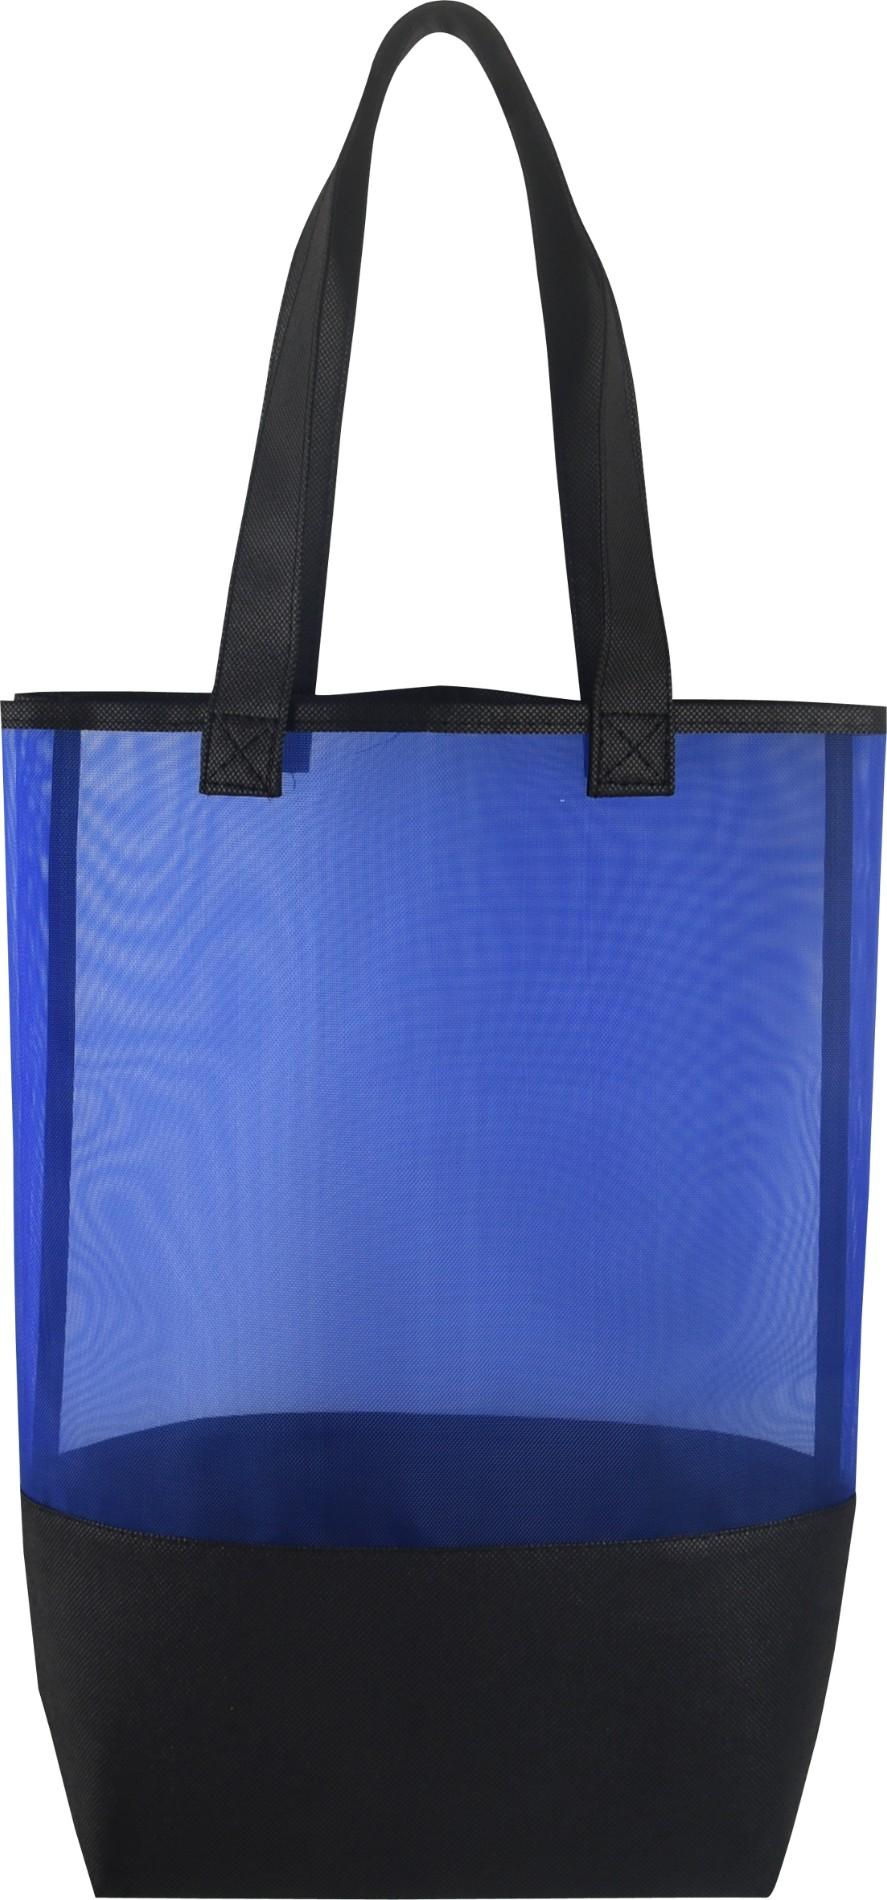 Buy Mesh Net Bag, Woven Poly Mesh Bags Wholesalers, Poly Woven Sacks Producers